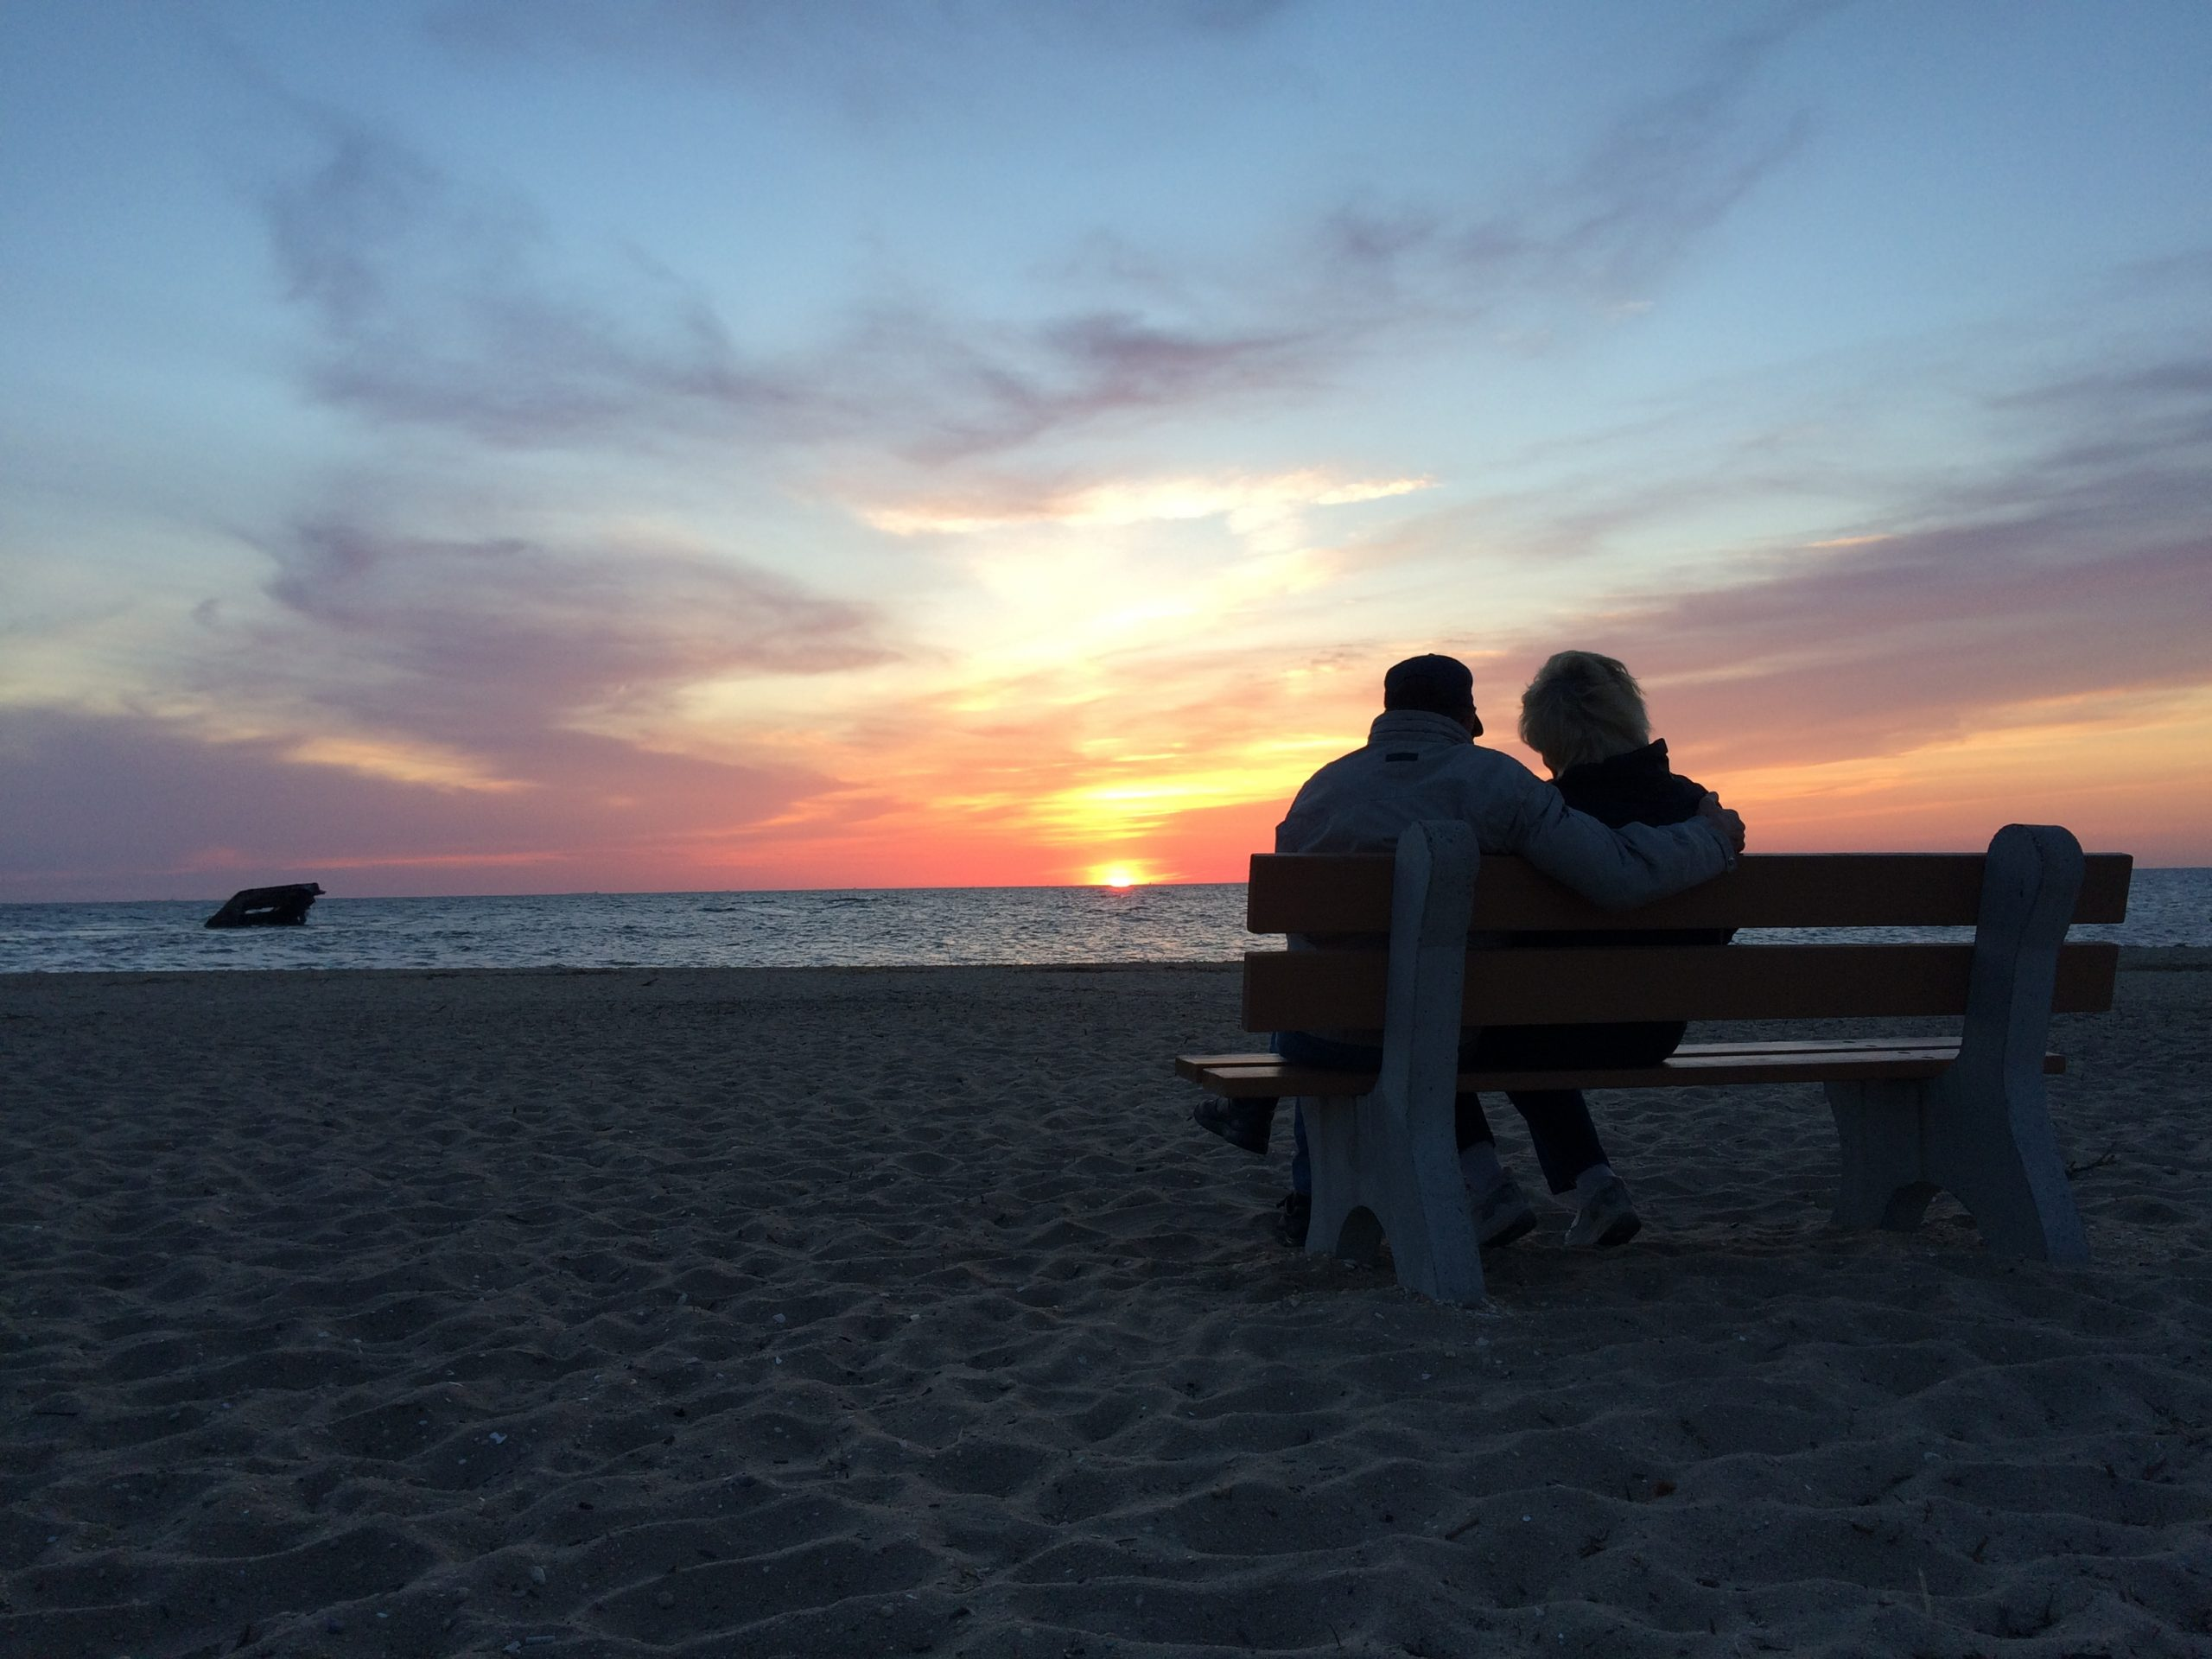 couple on bench on beach